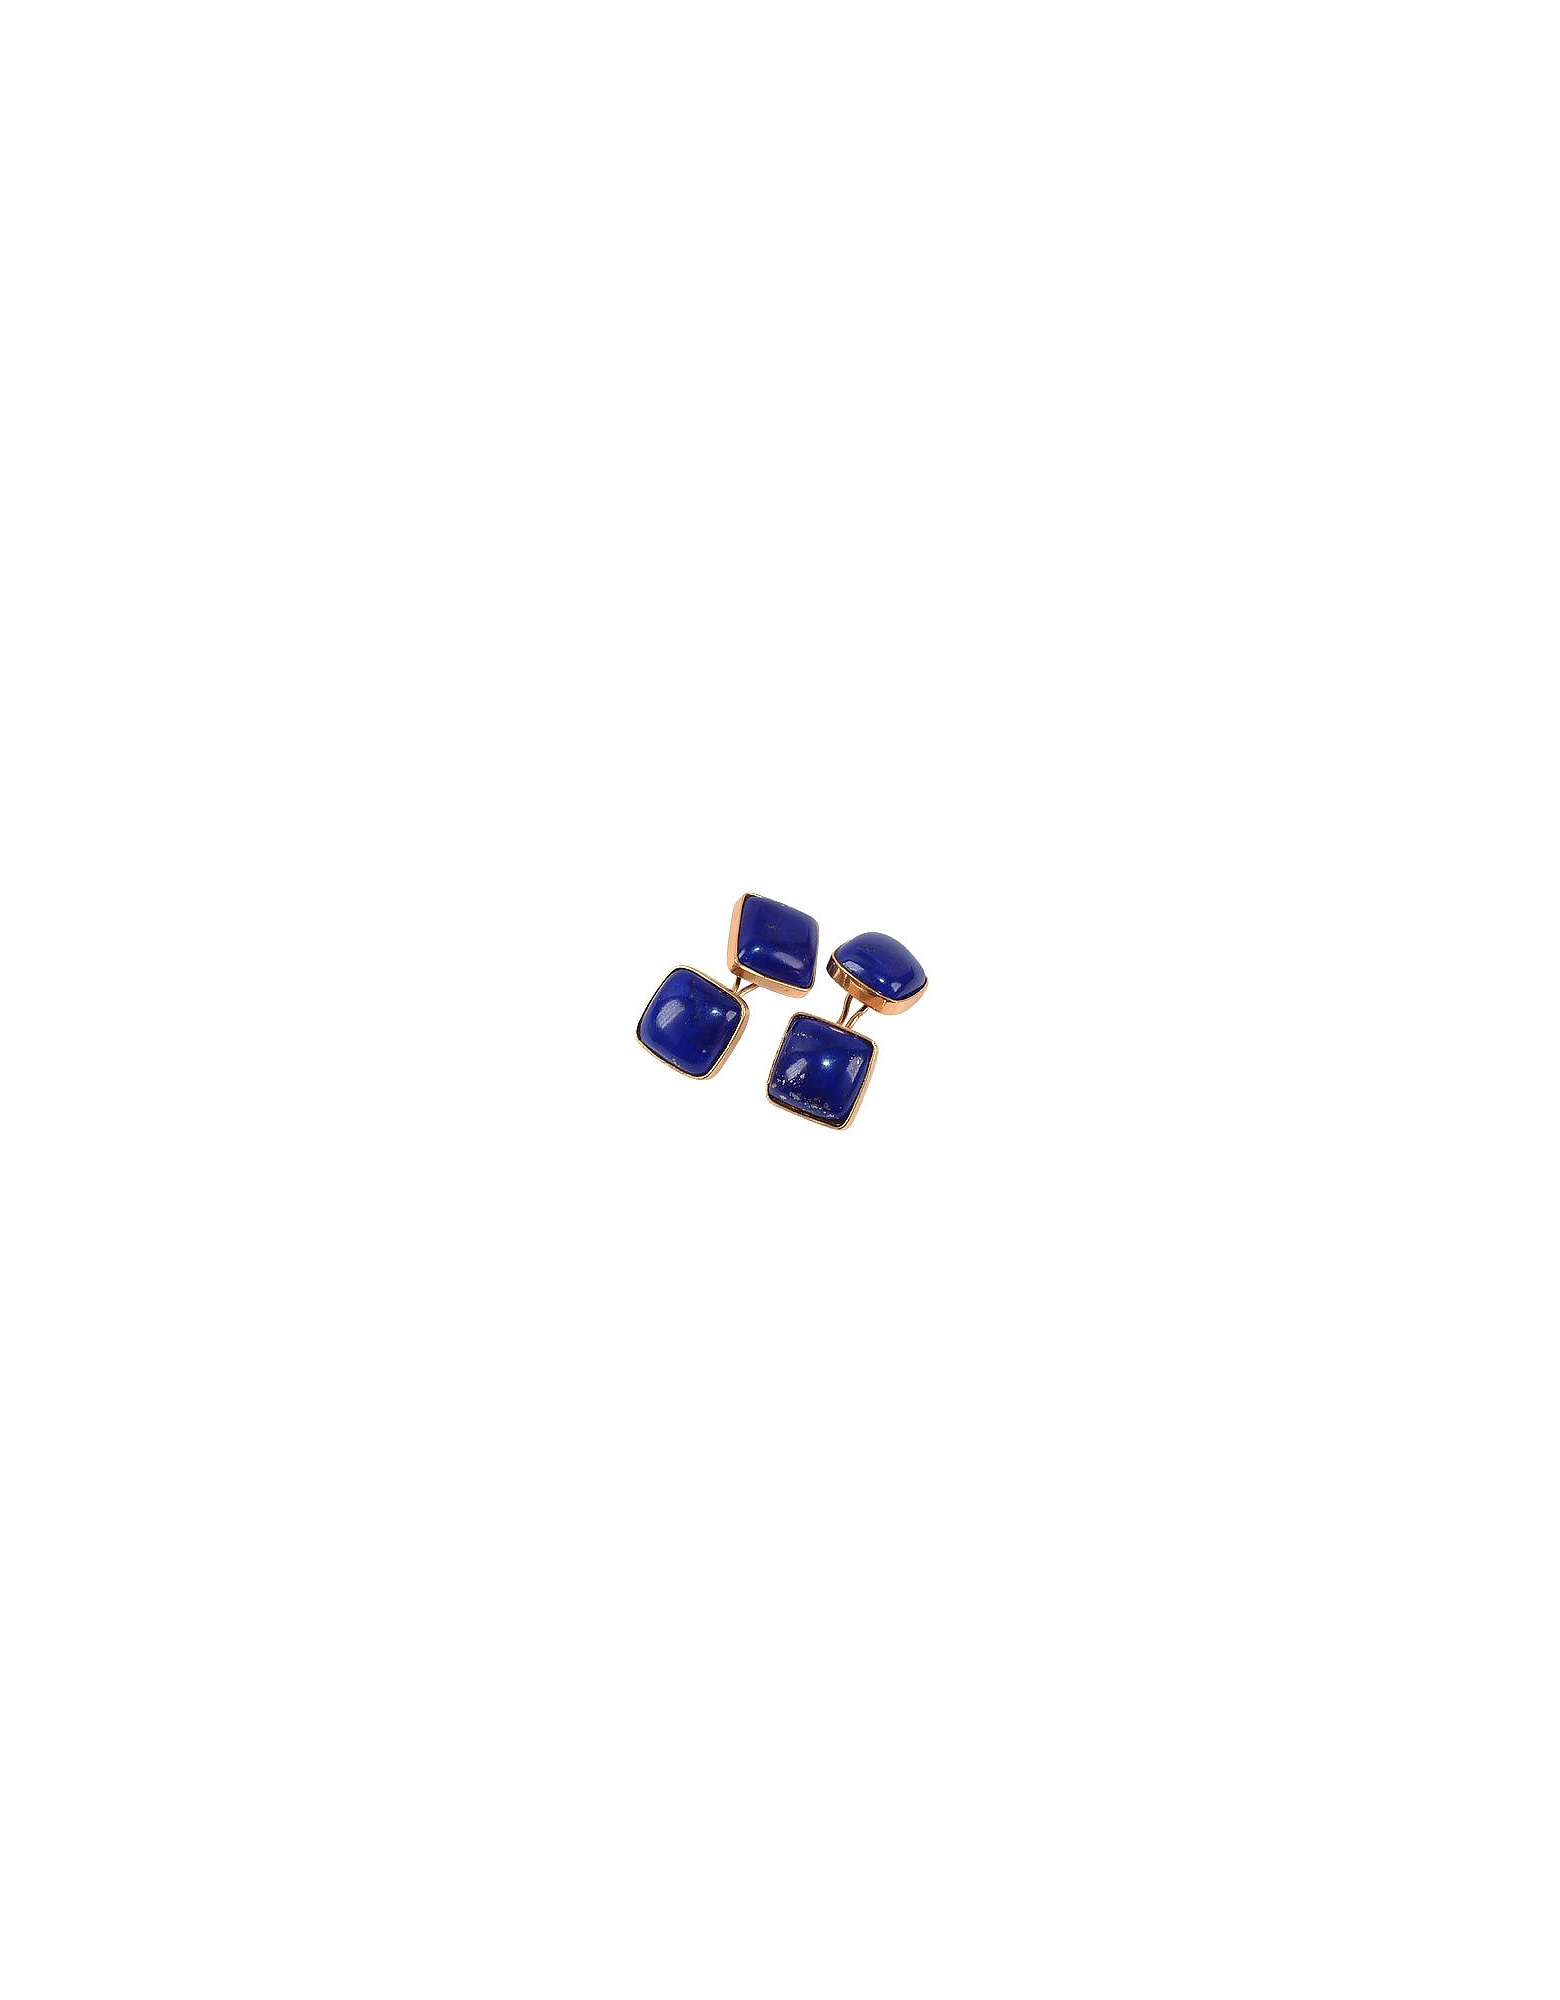 Gemelli in Oro con Lapislazzuli Blu